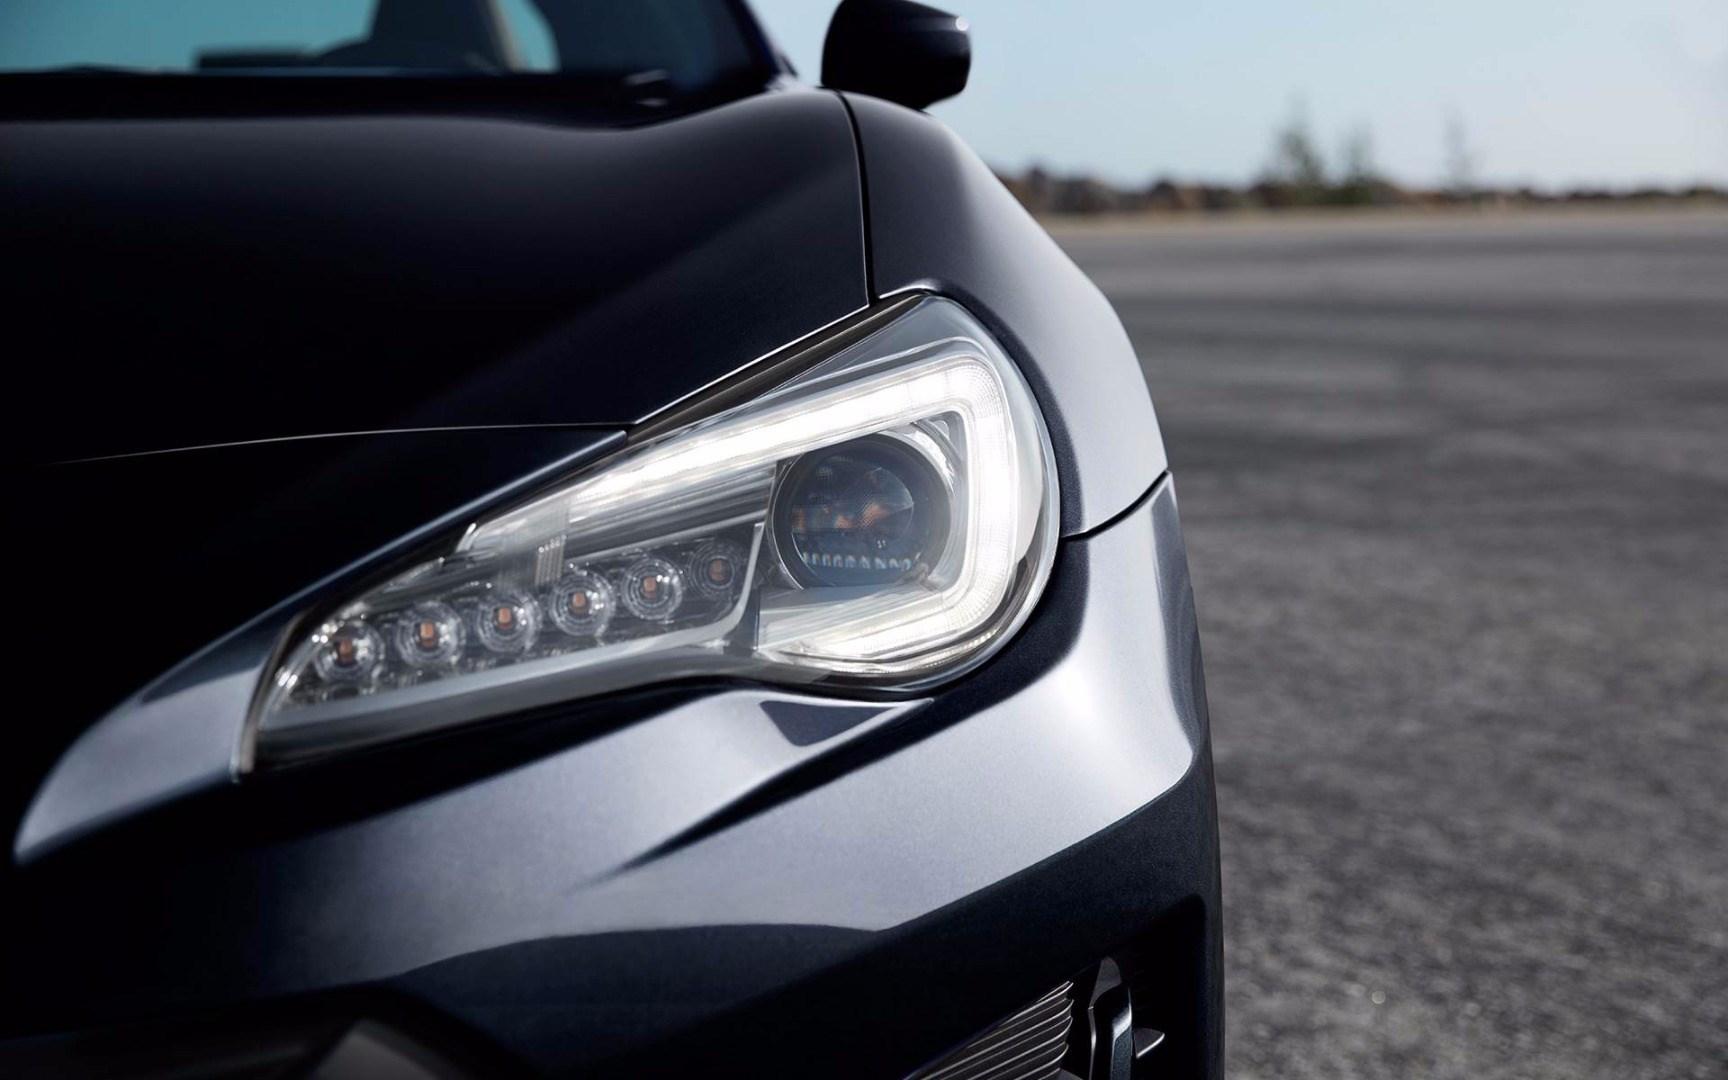 2017 Subaru BRZ Thumbnail